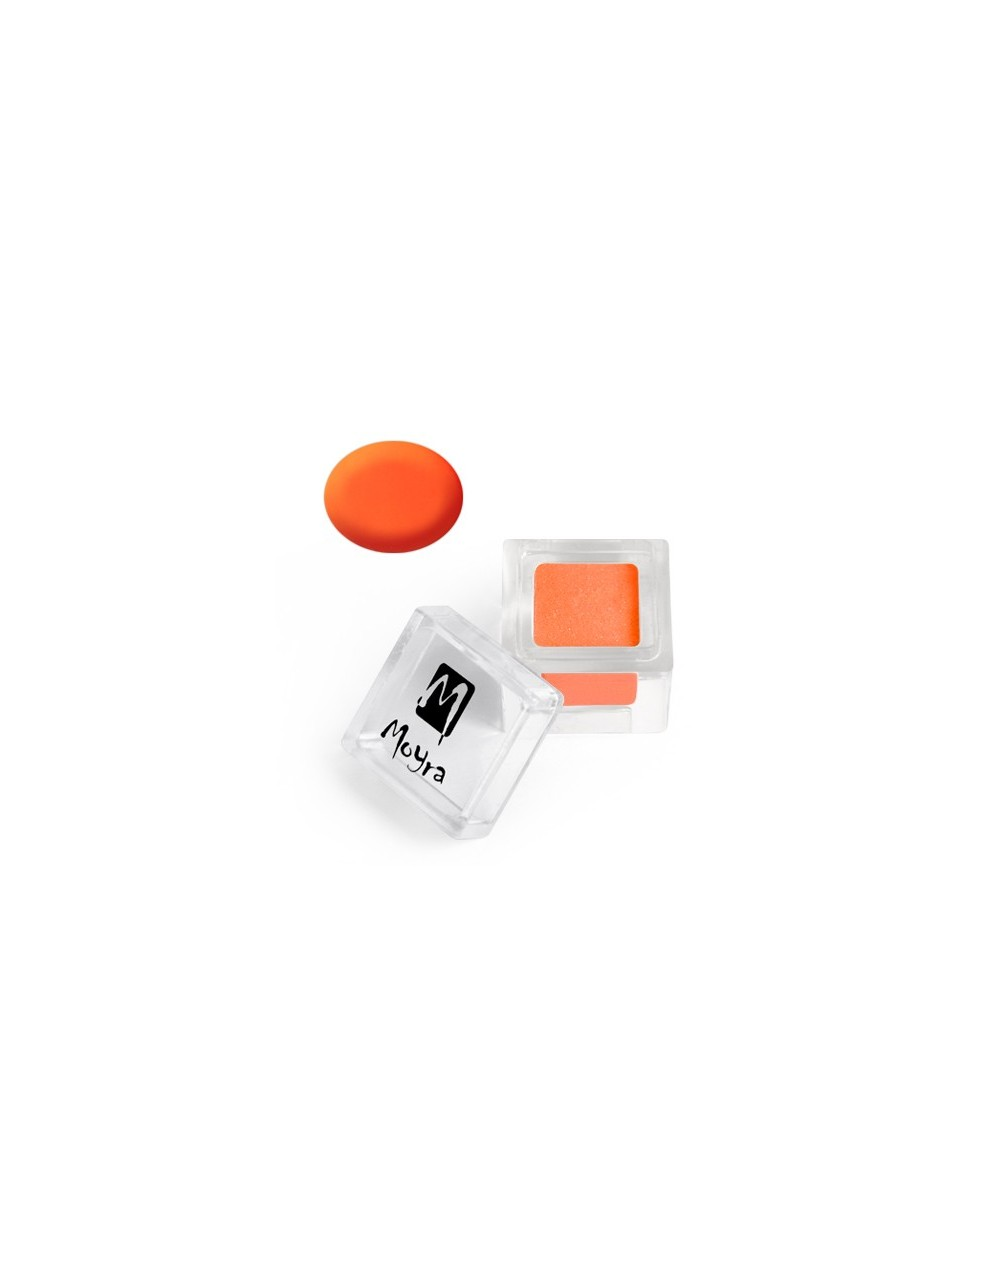 27 Neon Orange